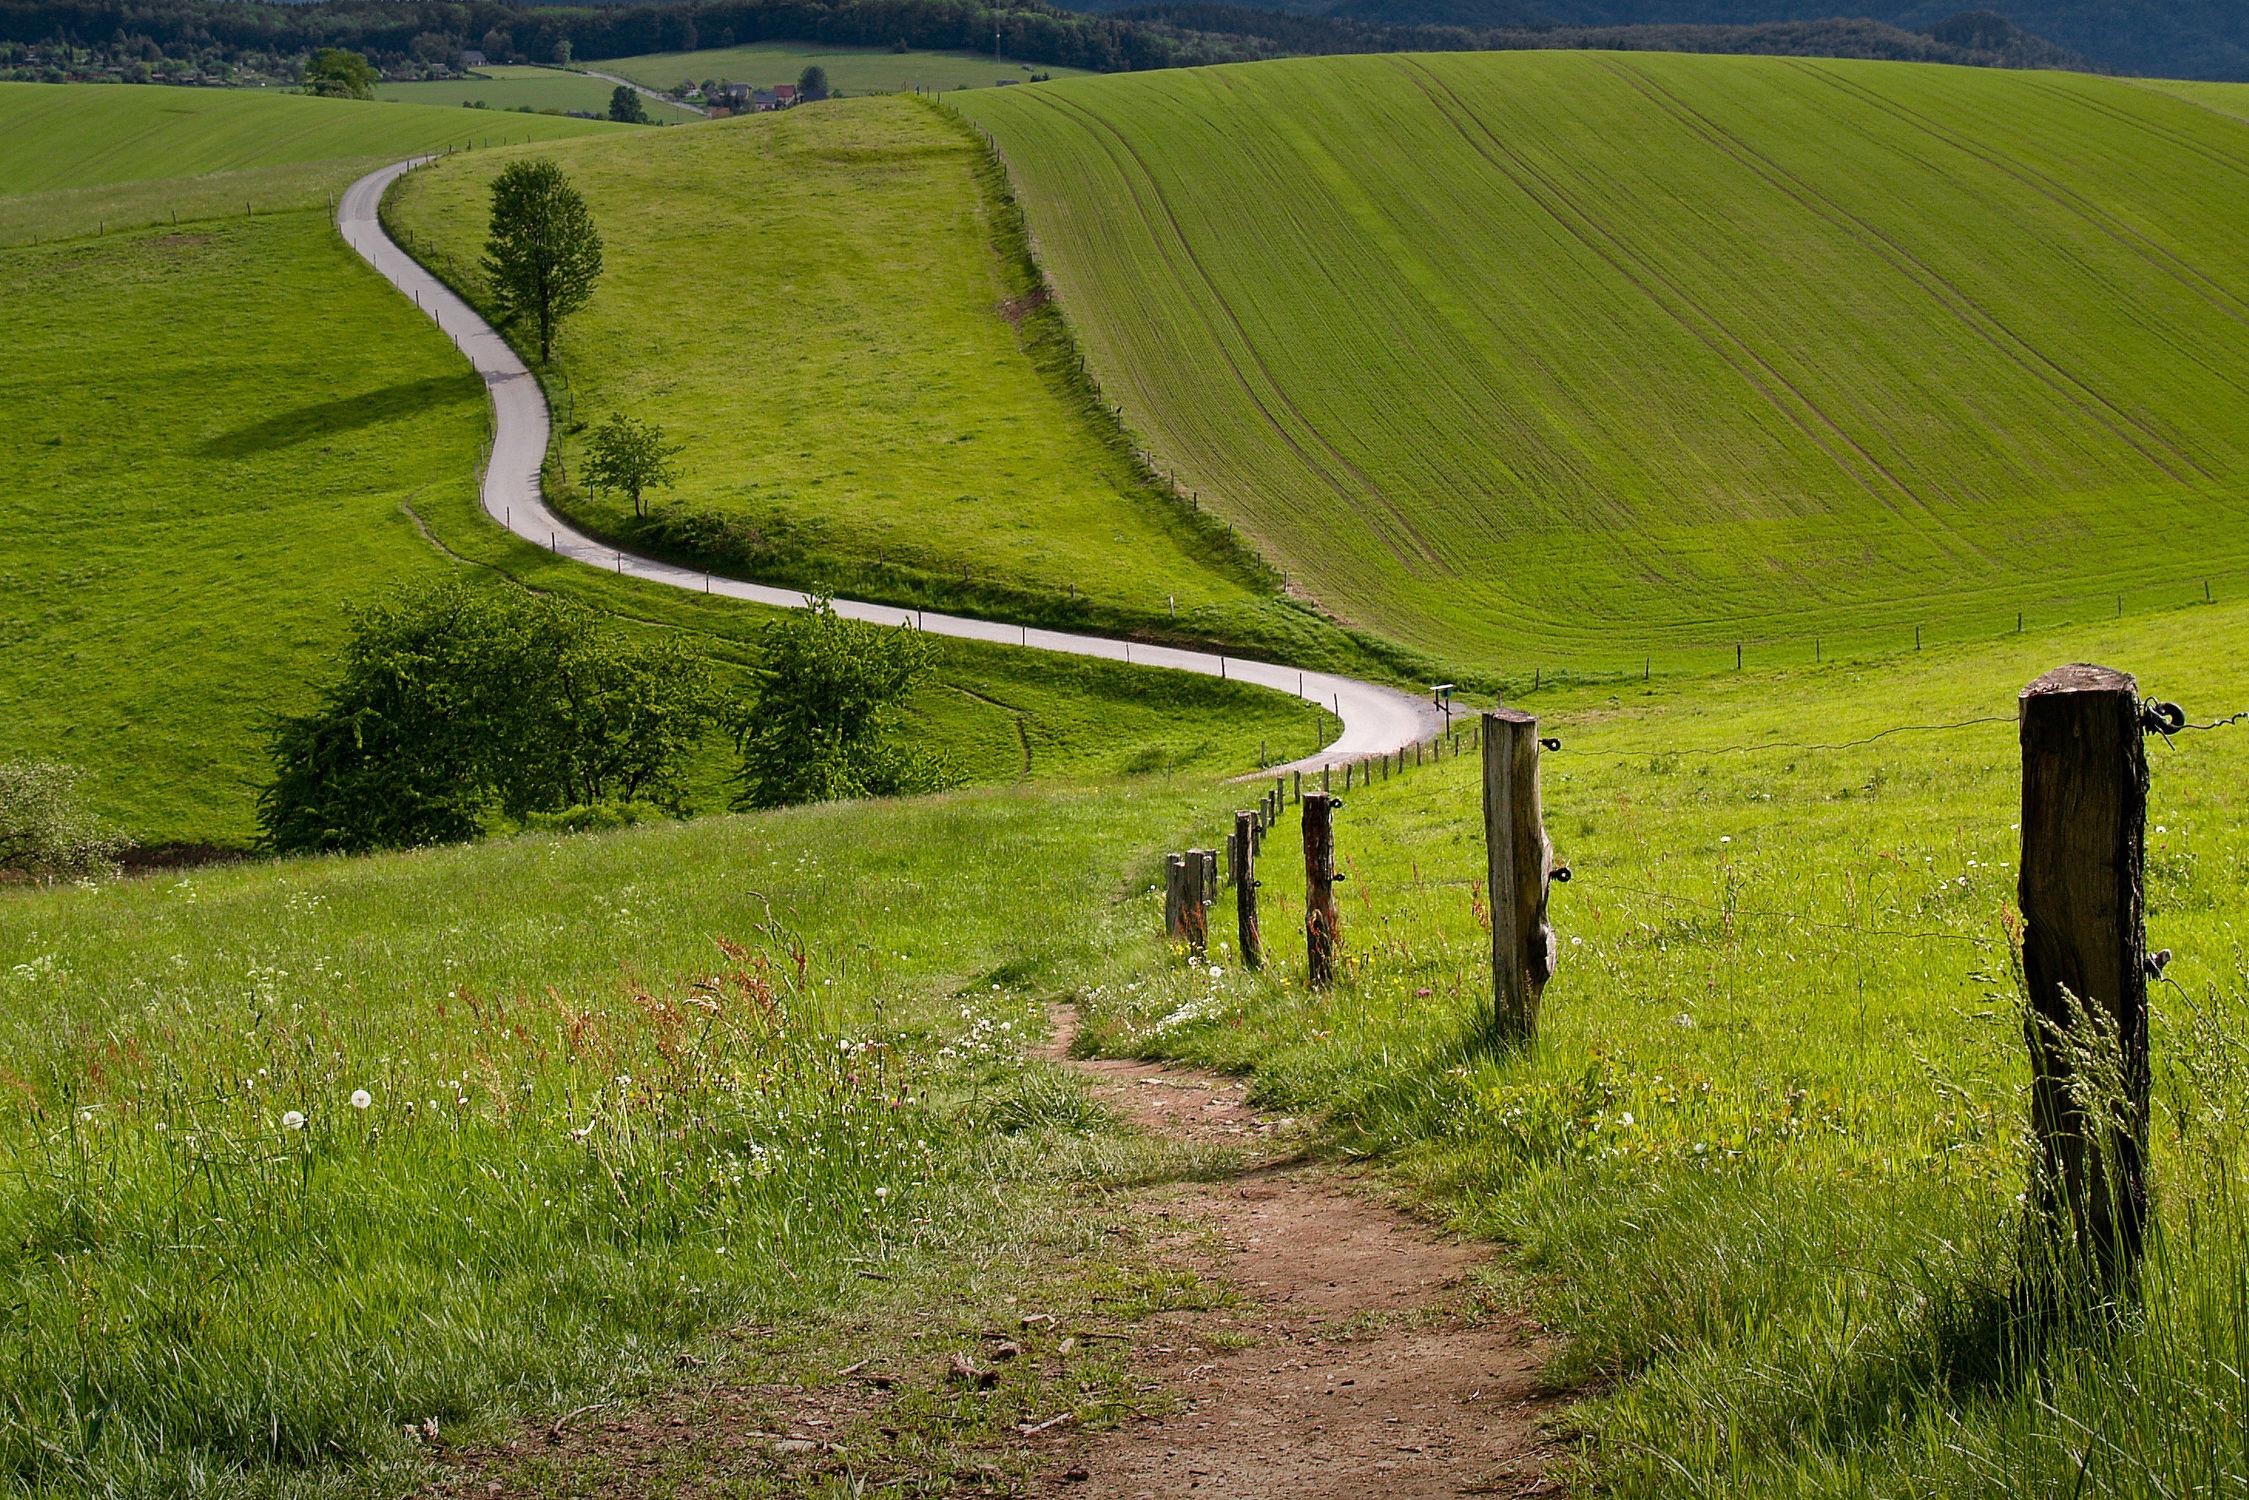 Bild mit Natur, Landschaften, Weg, Landschaft, Wiese, Feld, Felder, Wege und Pfade, Wiesen, Feldweg